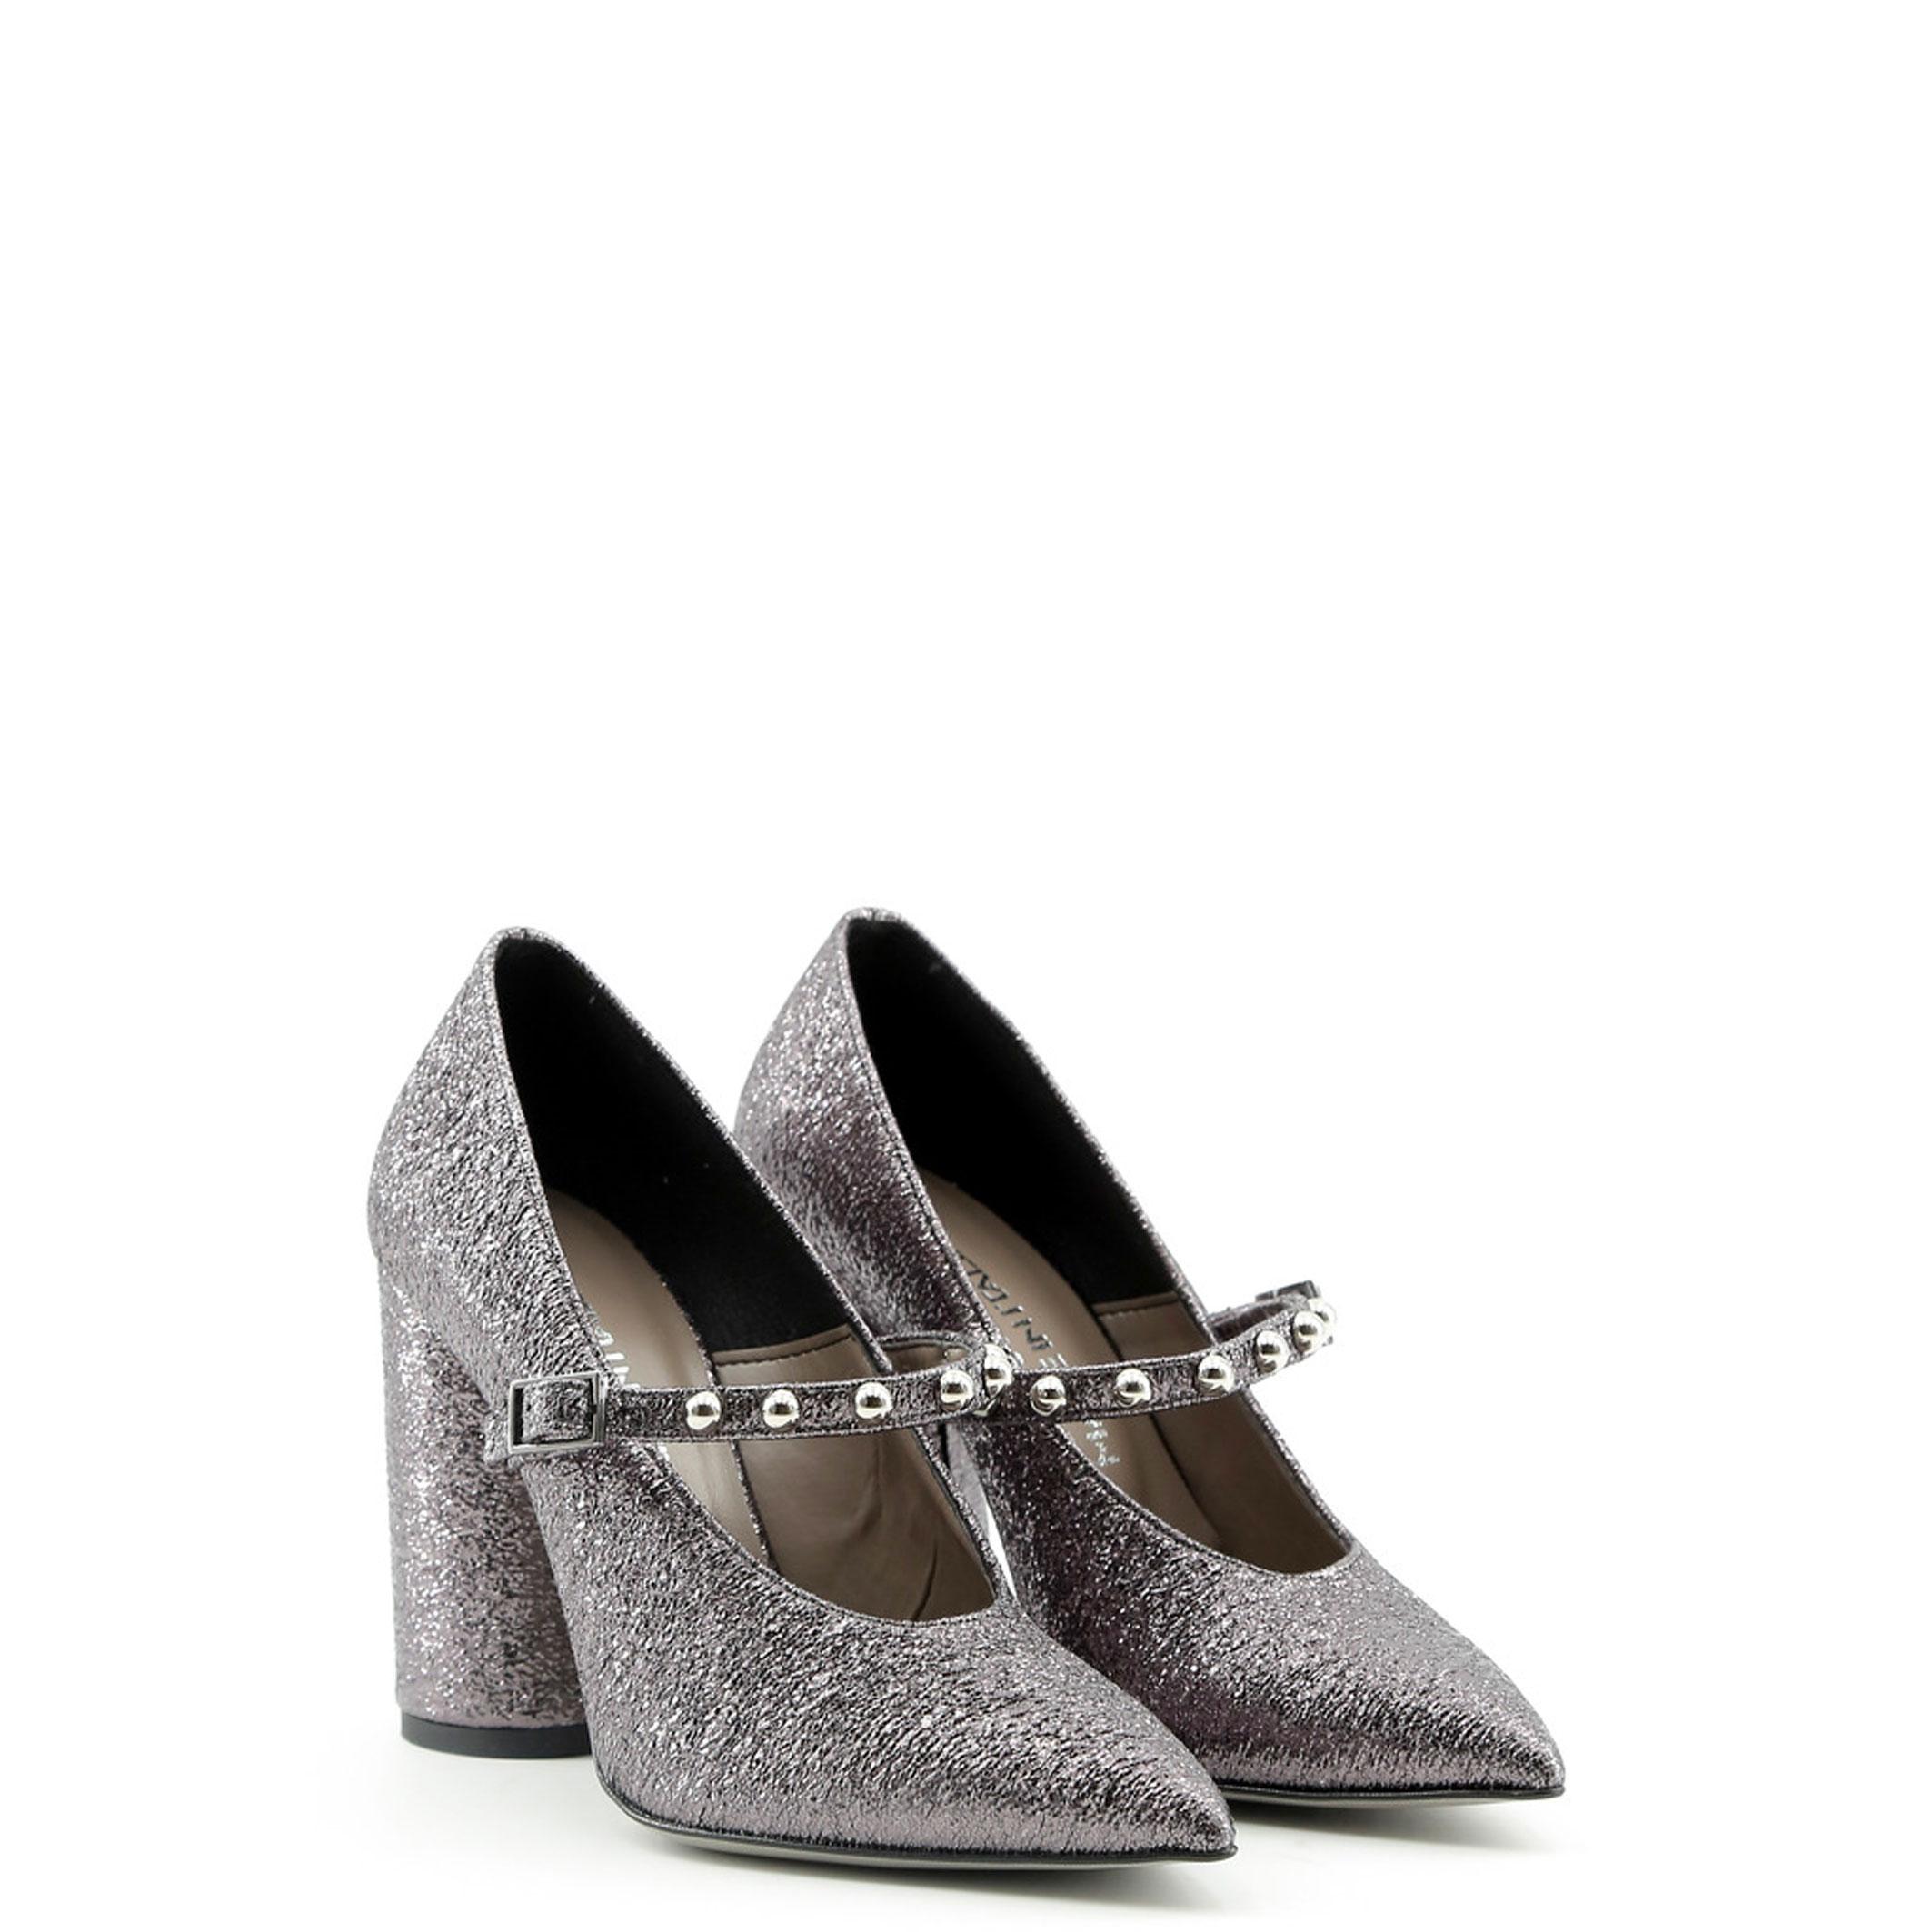 Schuhe AMELIA, Damen High High Damen Heels Grau/Schwarz pumps hochzeit 954815